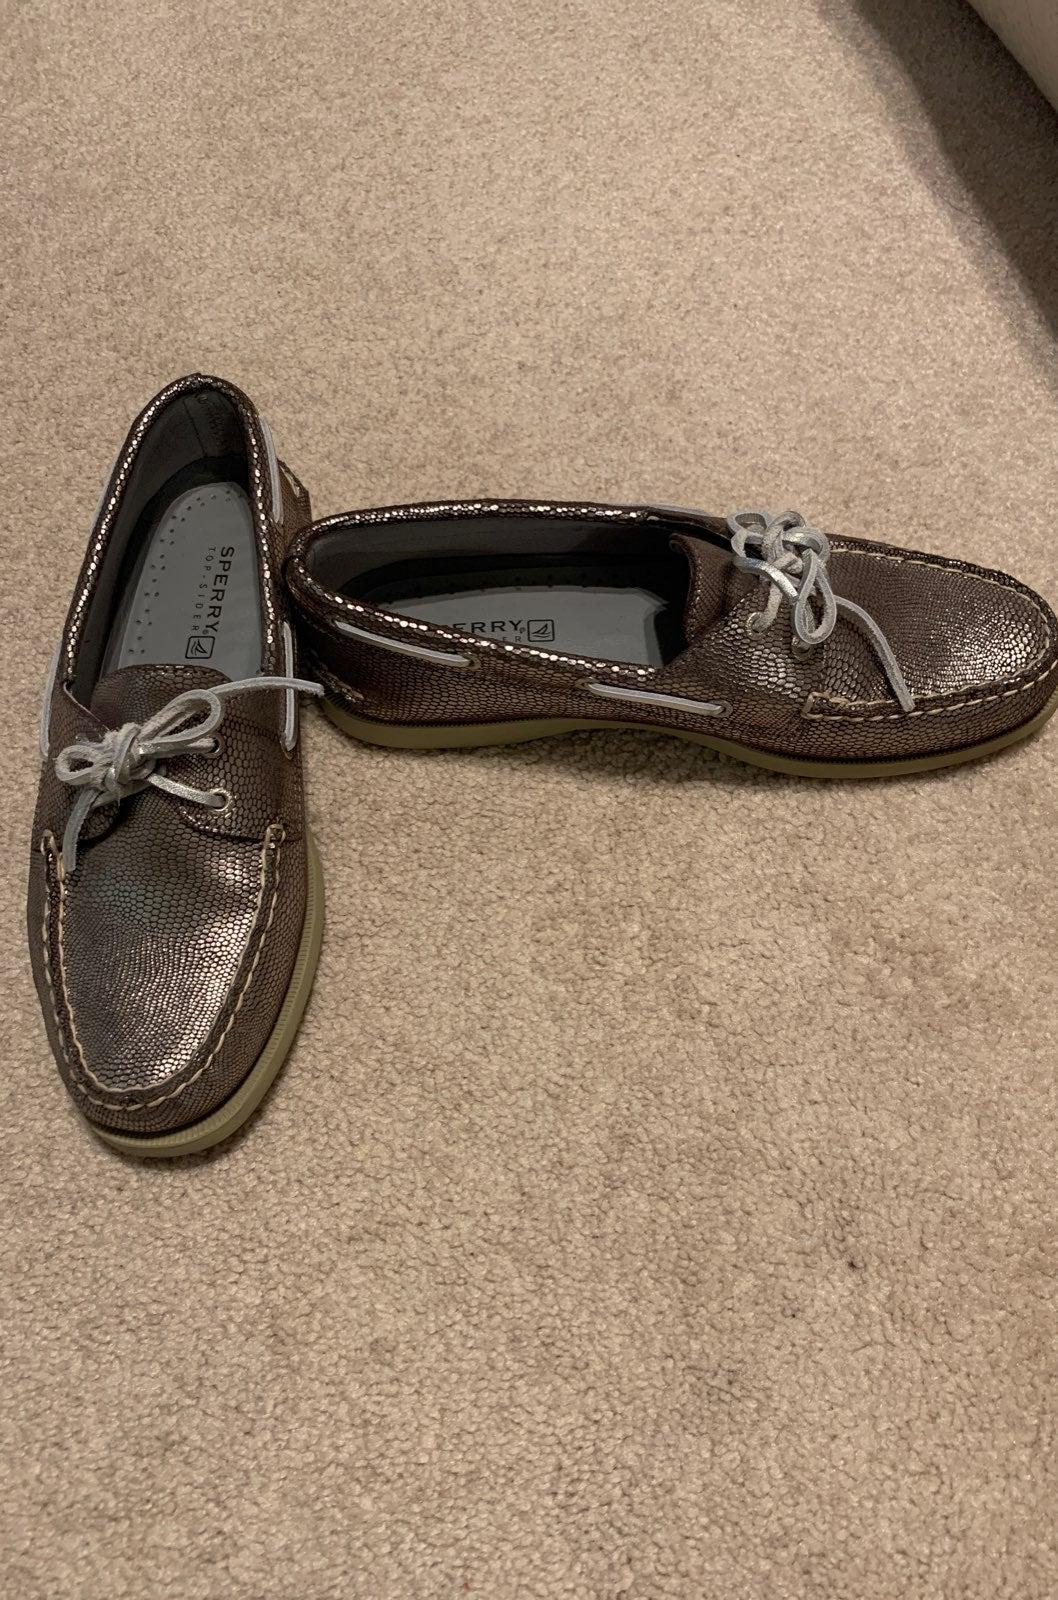 Sperry metallic boat shoe